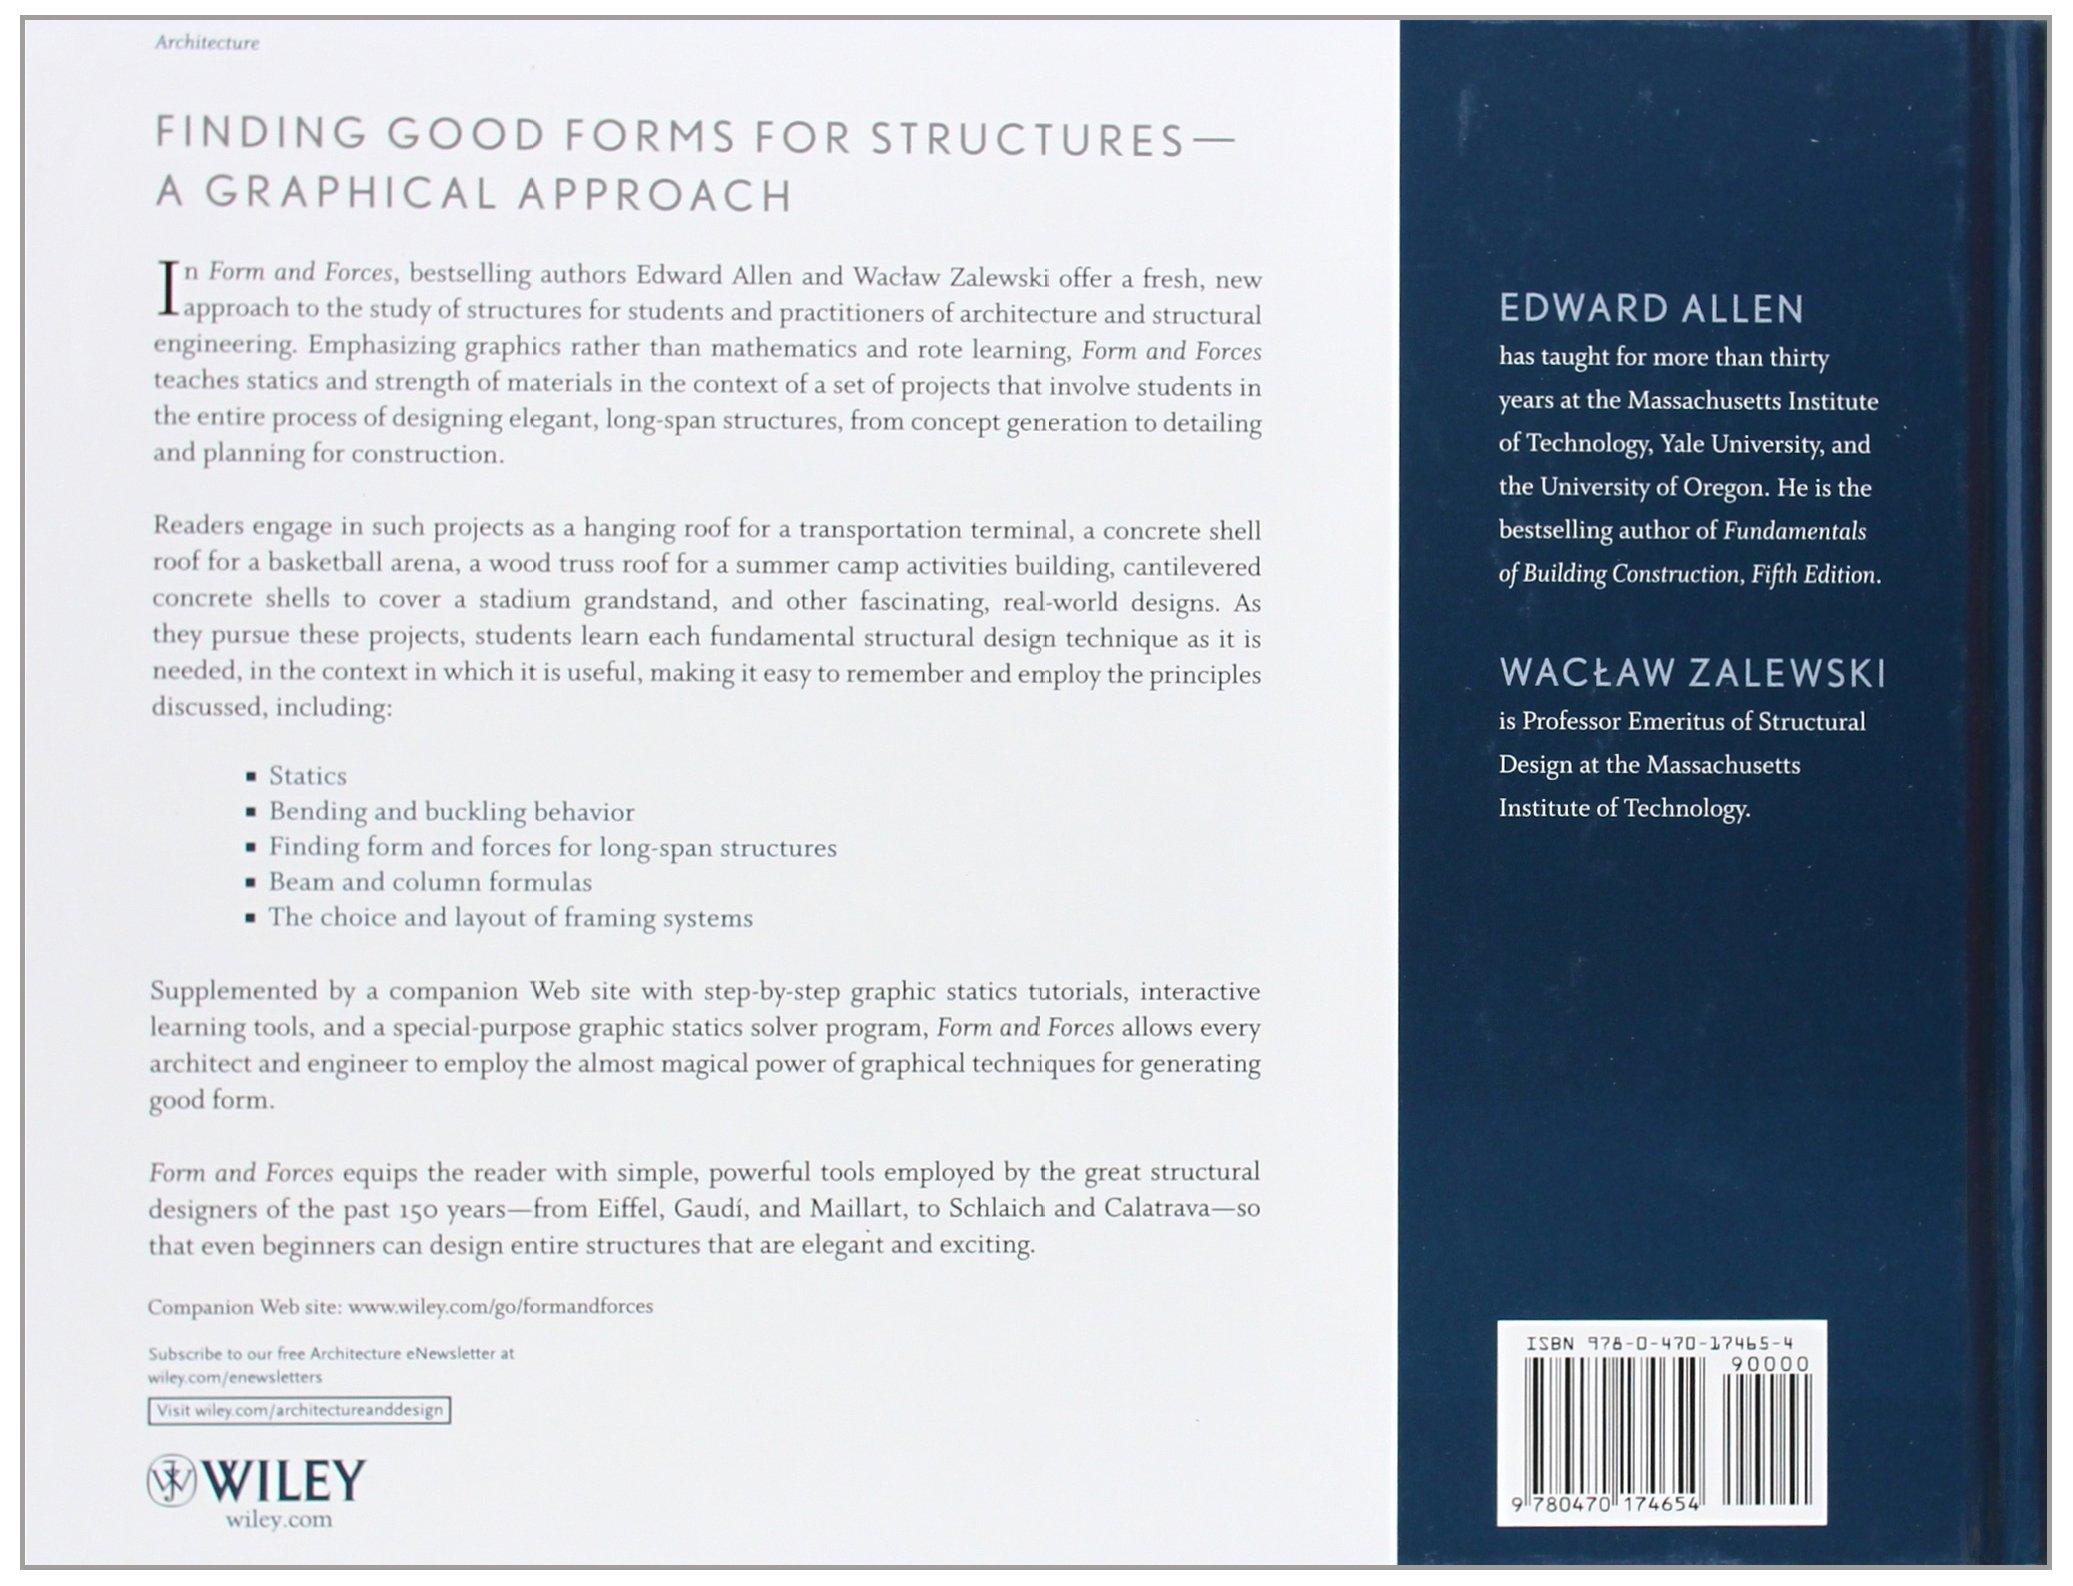 Form and forces designing efficient expressive structures edward allen waclaw zalewski 9780470174654 books amazon ca